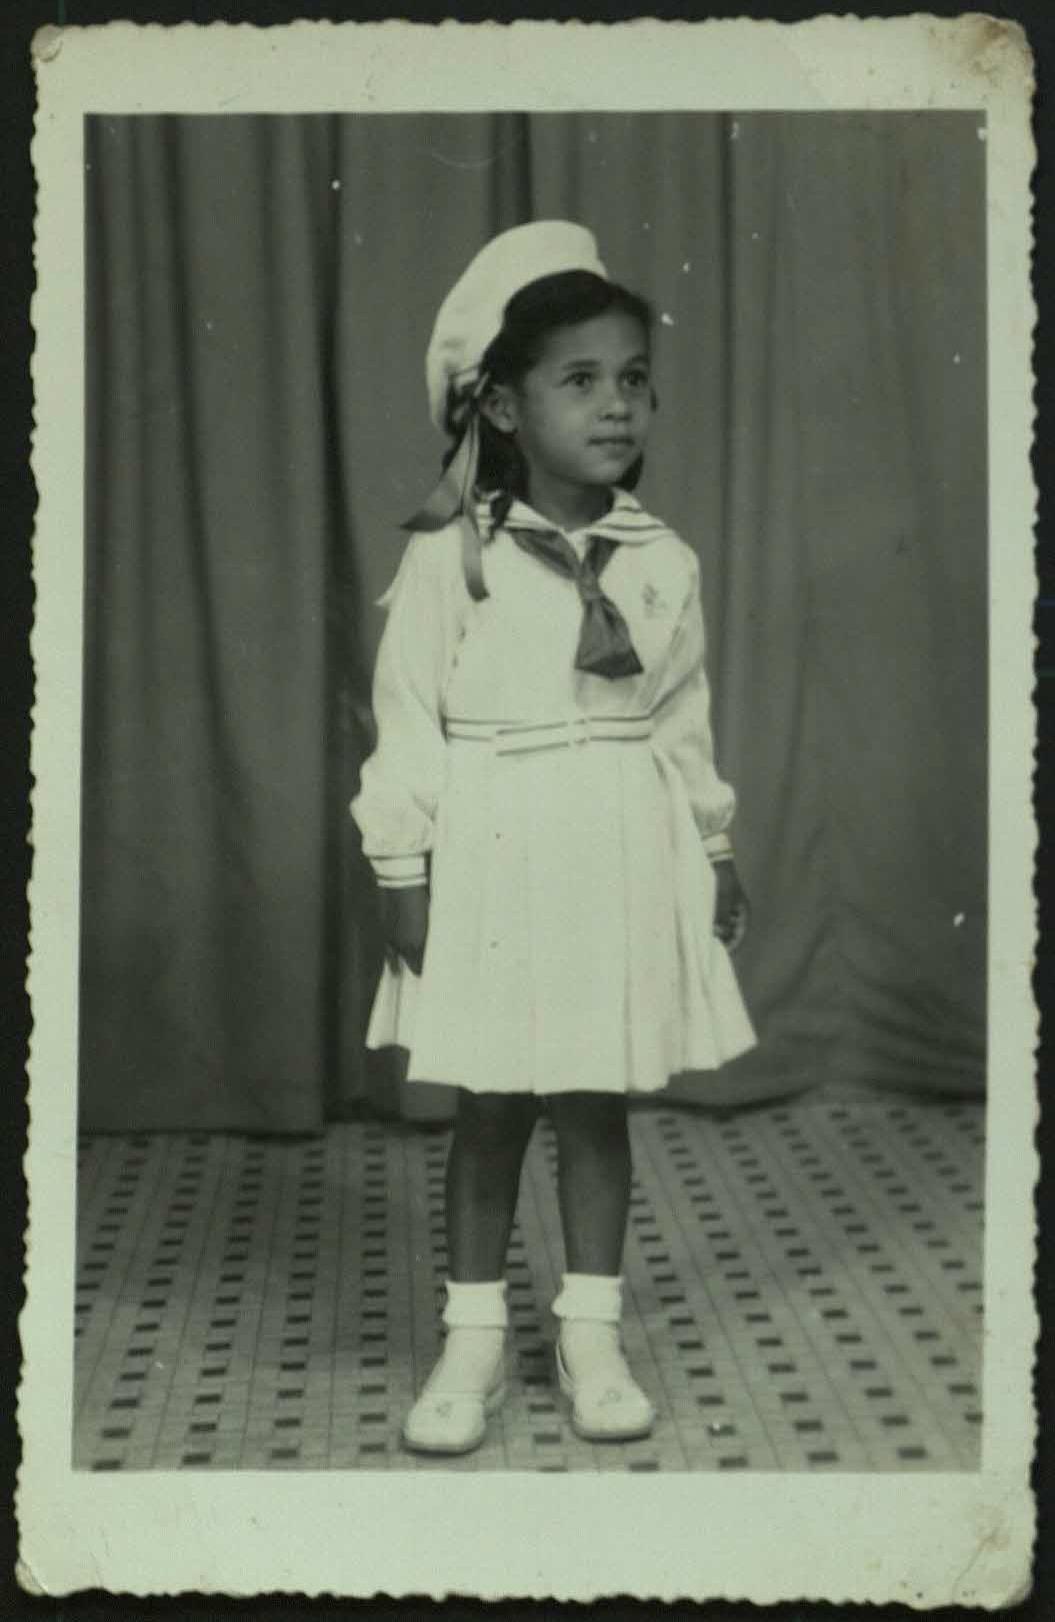 5-year old Rita in a religious school uniform.